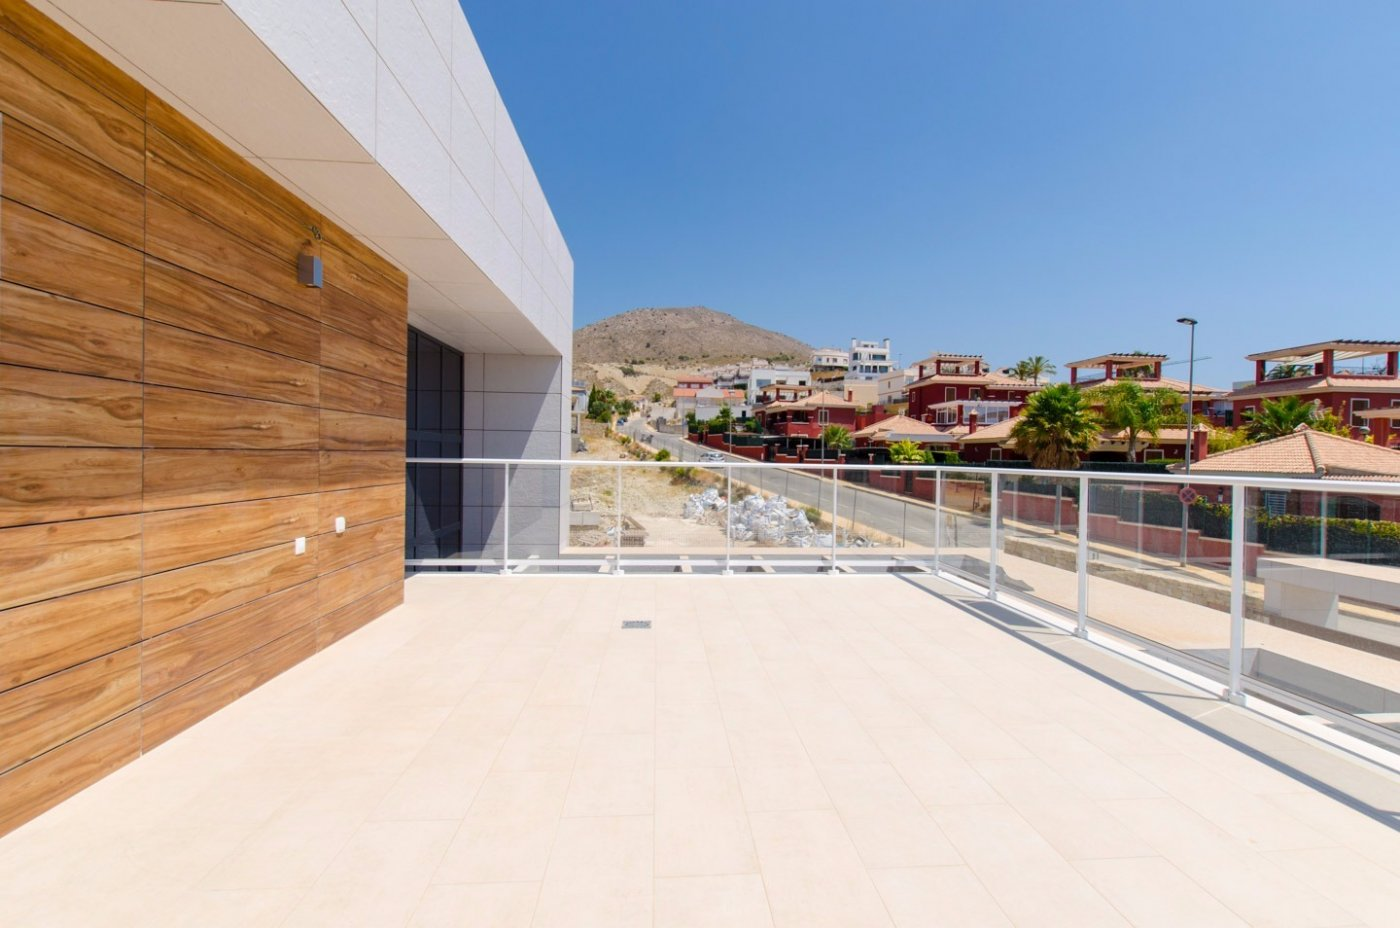 Villas modernas en balcÓn de finestrat a un paso de benidorm!!! - imagenInmueble11